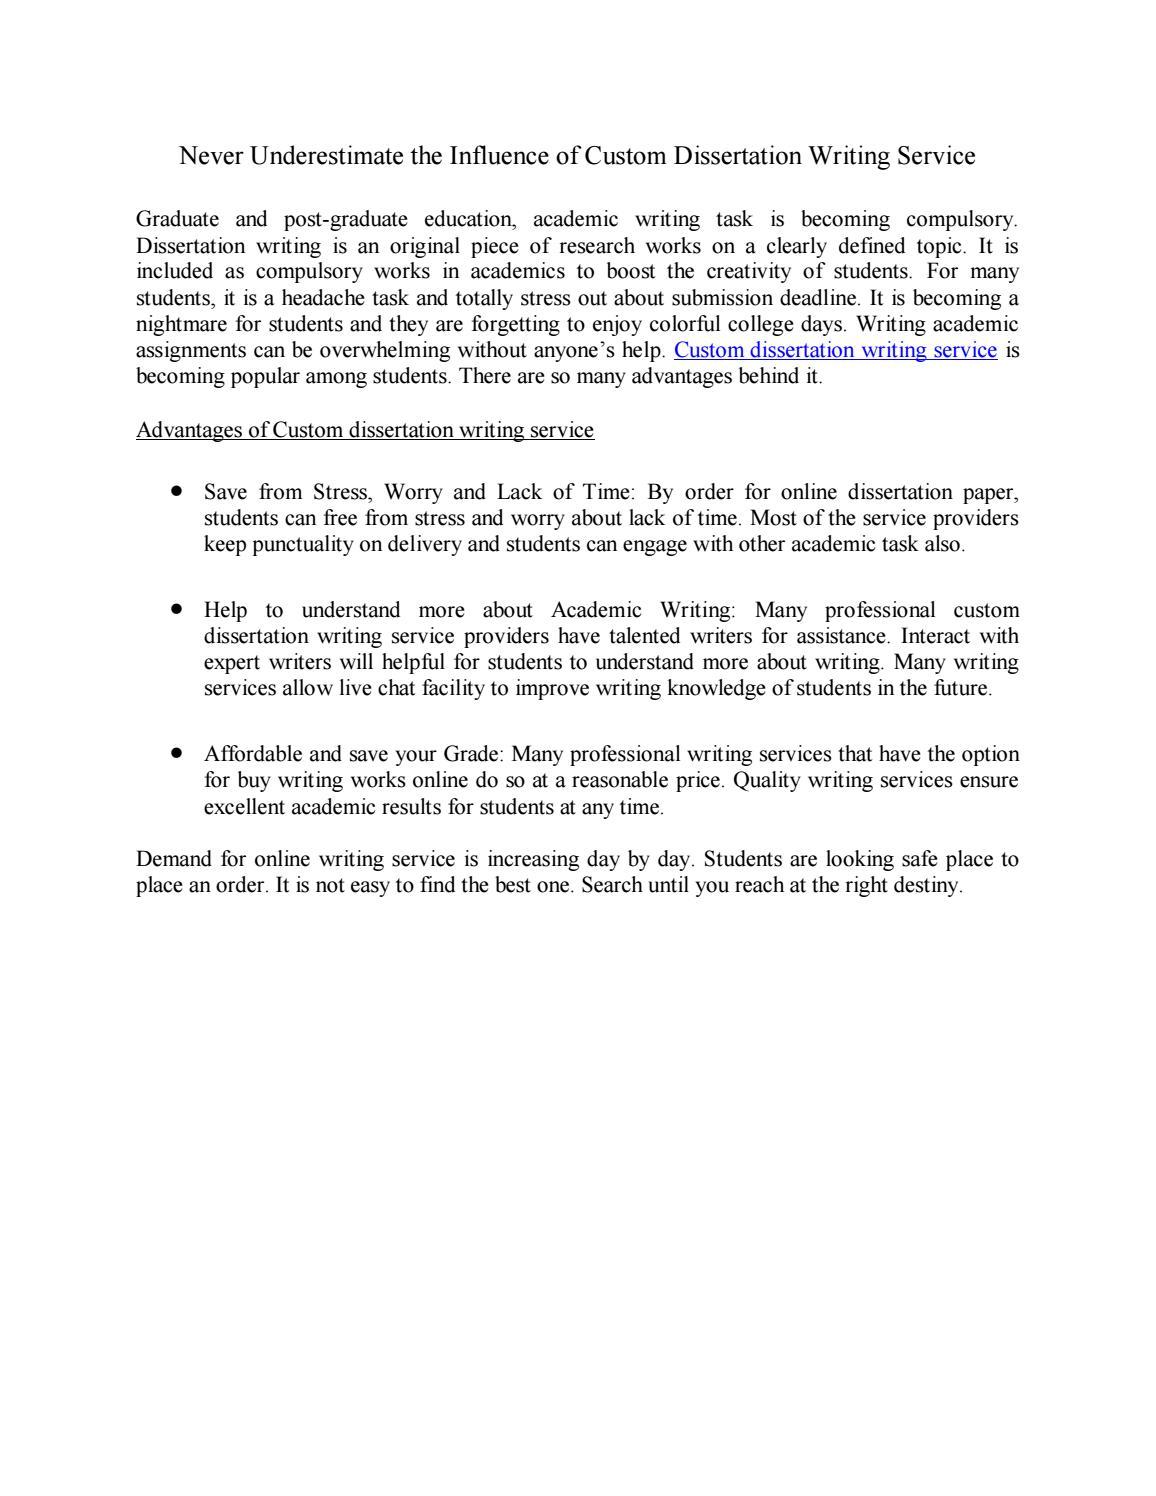 custom dissertation results writers sites